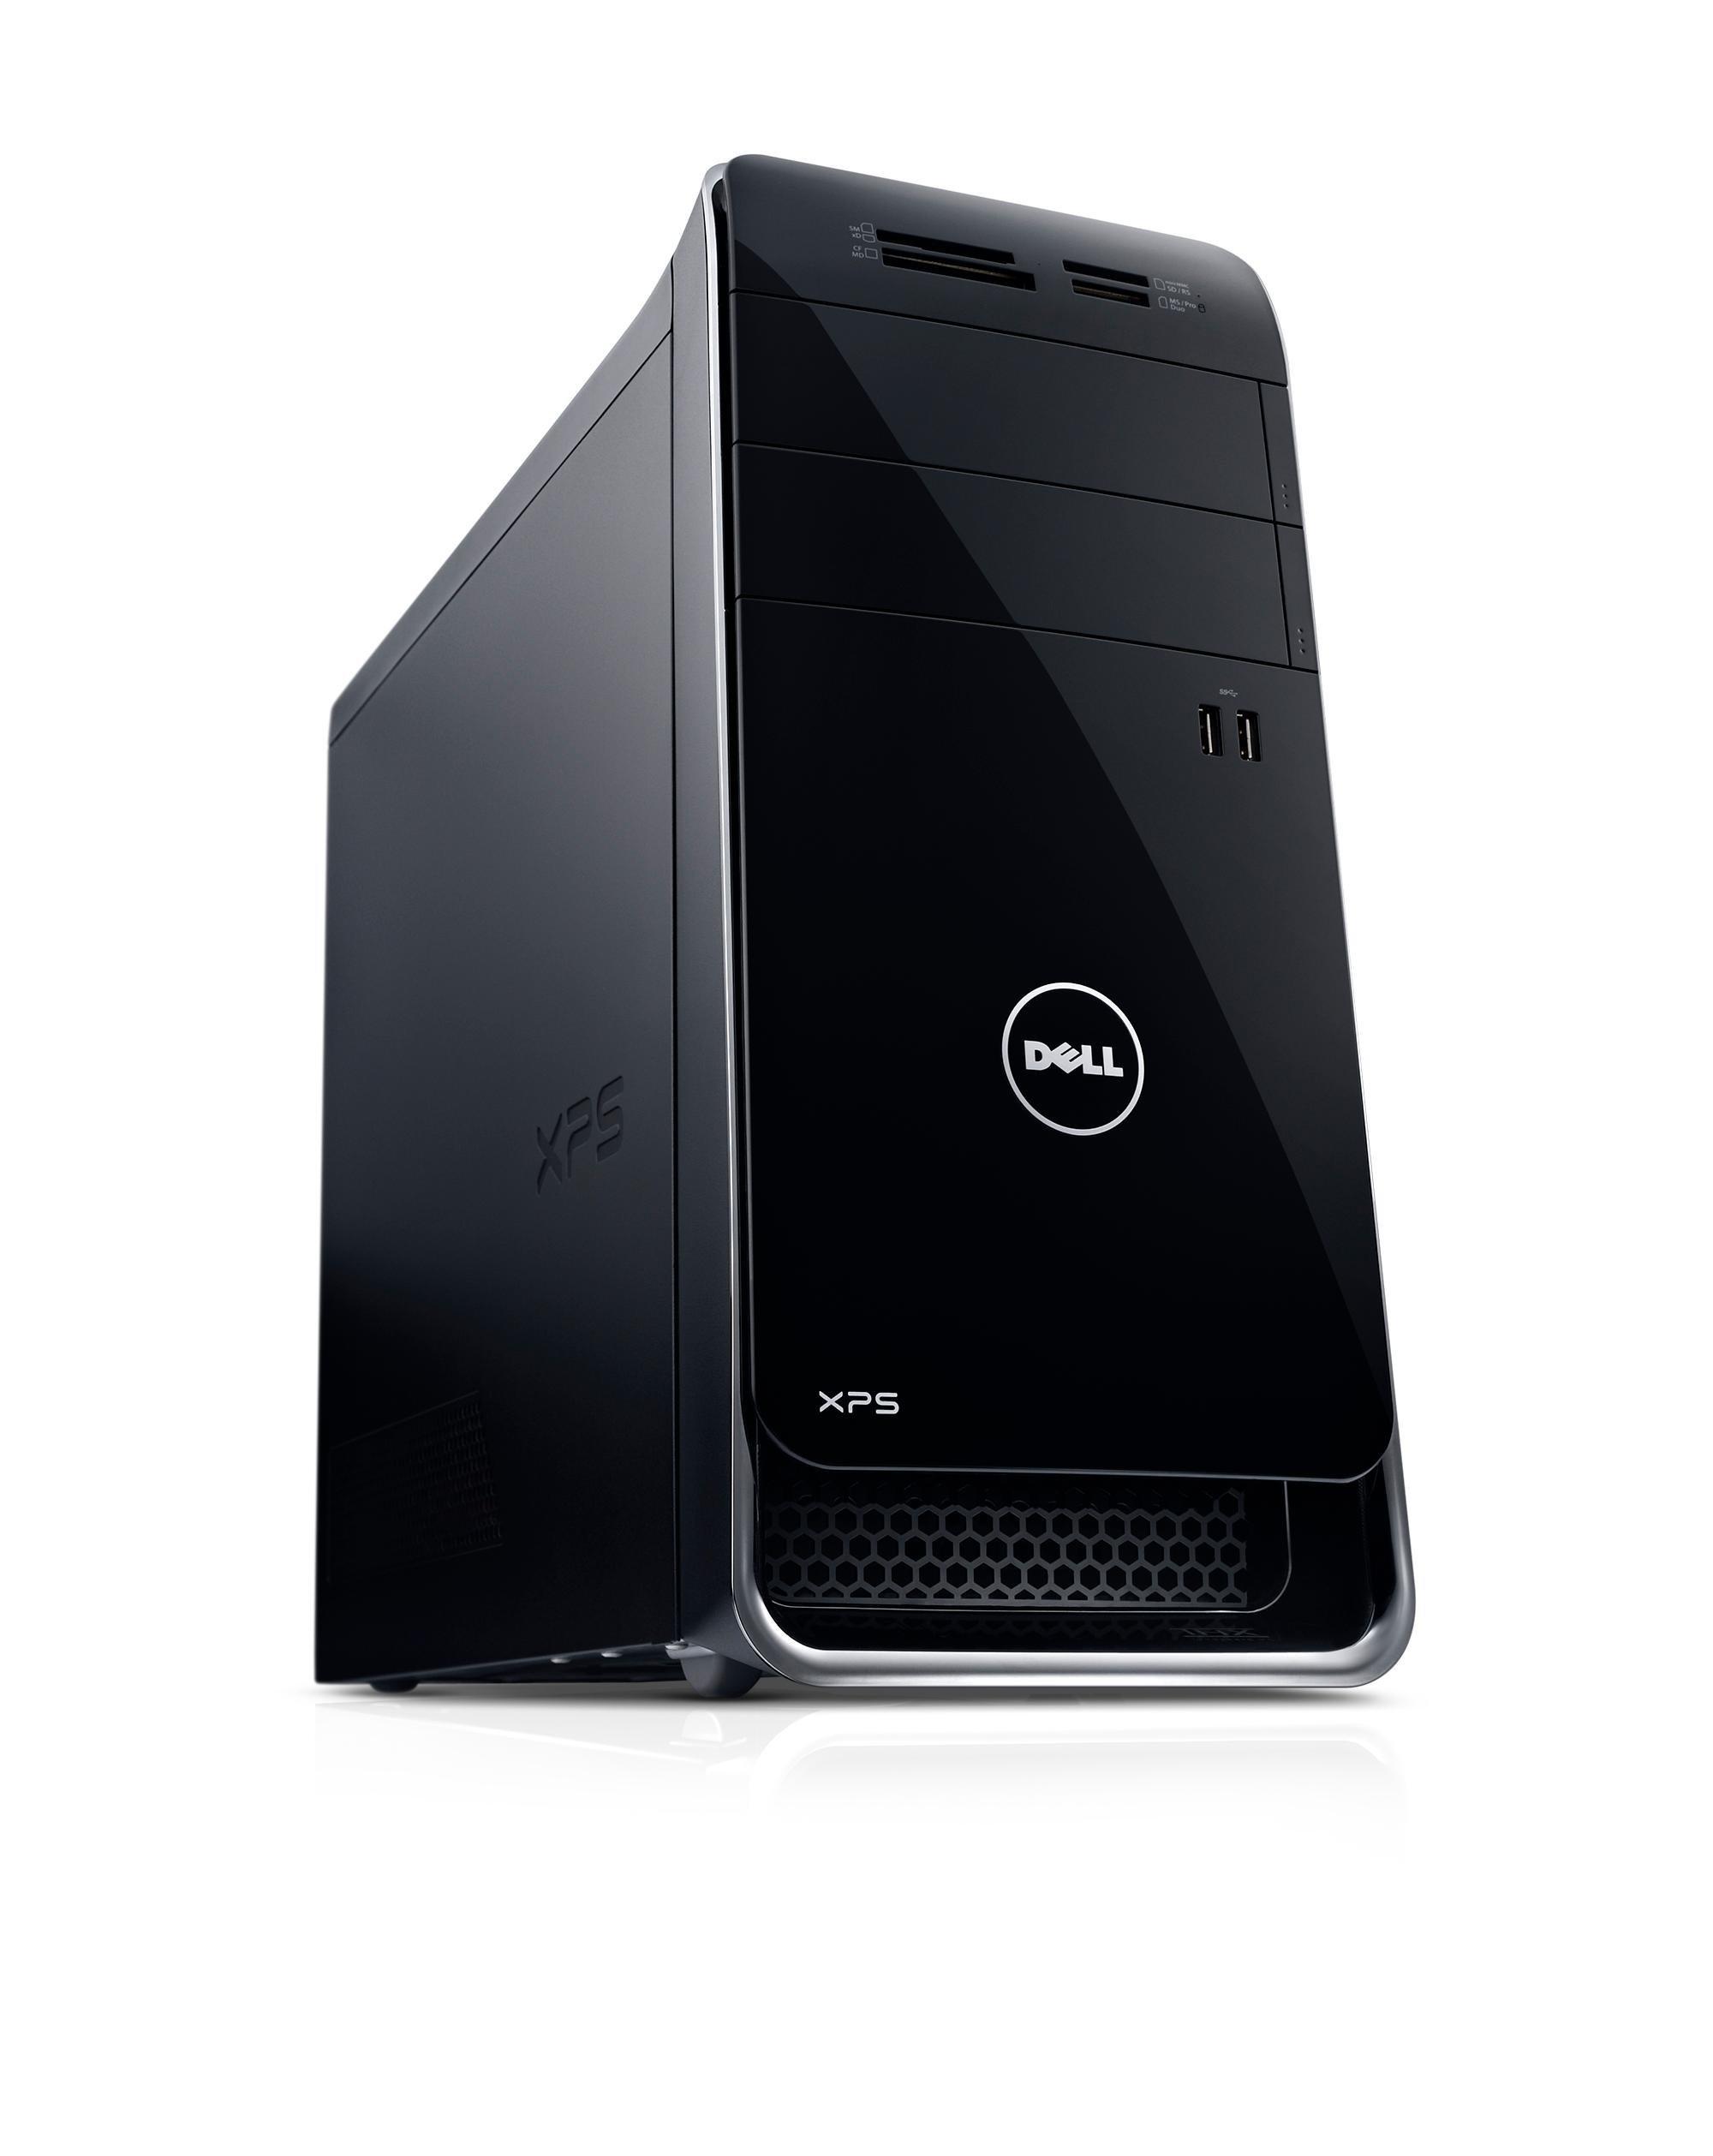 dell xps x8900 3760blk tower desktop intel core i5 6400 2 7ghz processor 8 gb ram. Black Bedroom Furniture Sets. Home Design Ideas